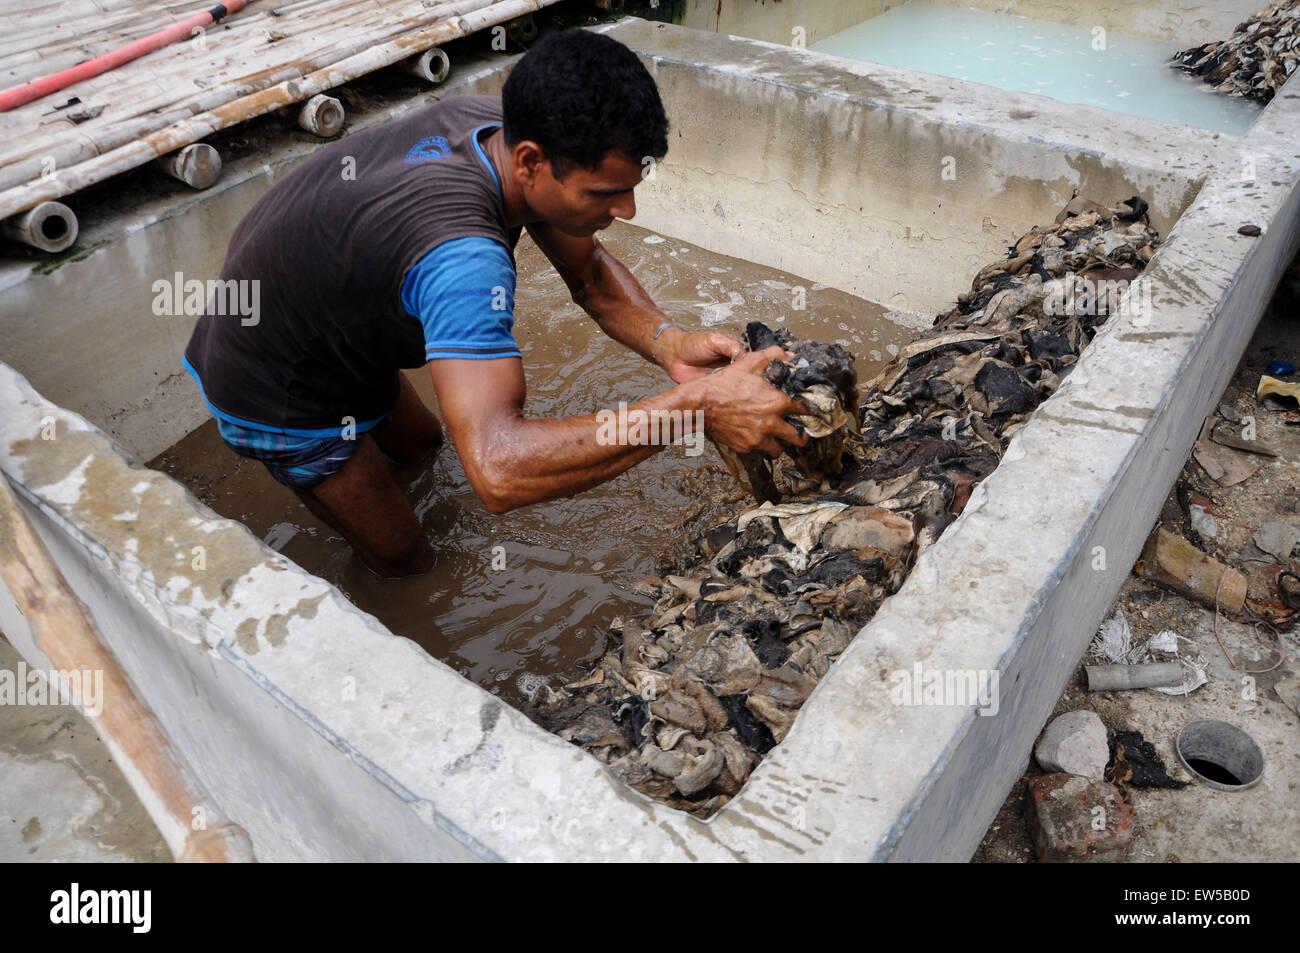 Dhaka, Bangladesh. 18th June, 2015. June 18, 2015 - Dhaka, Bangladesh - A tannery worker is processing raw skins - Stock Image